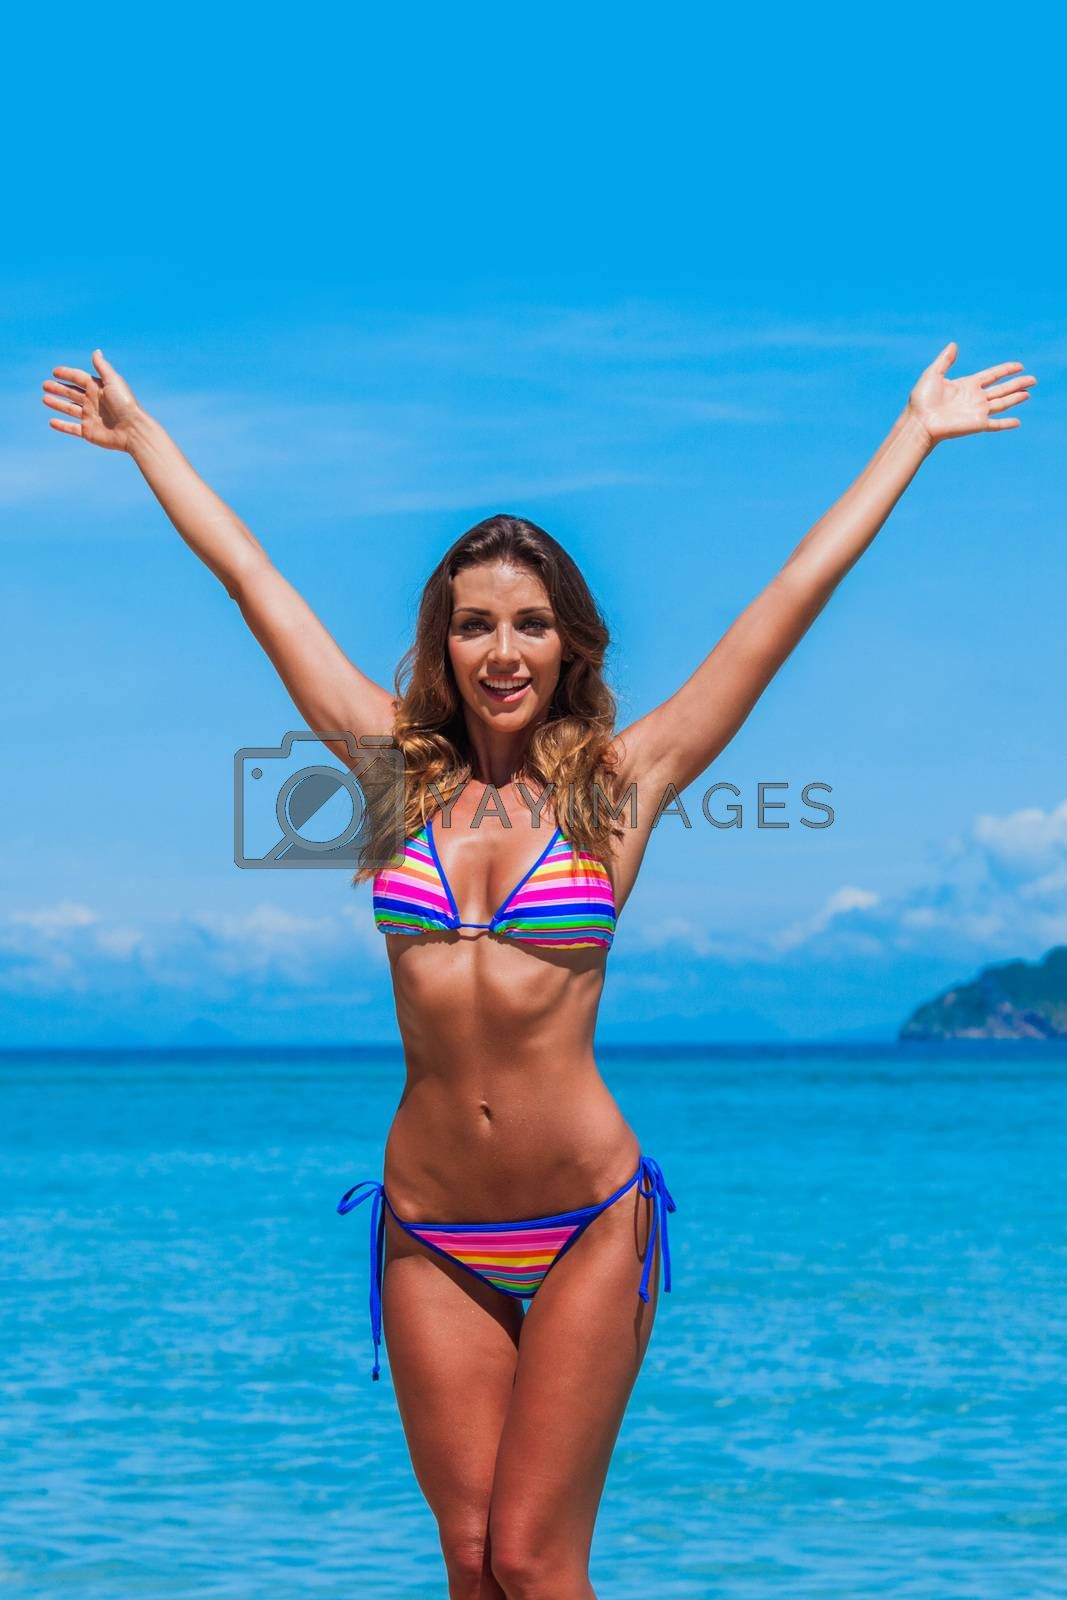 Beach summer holidays woman by Yellowj